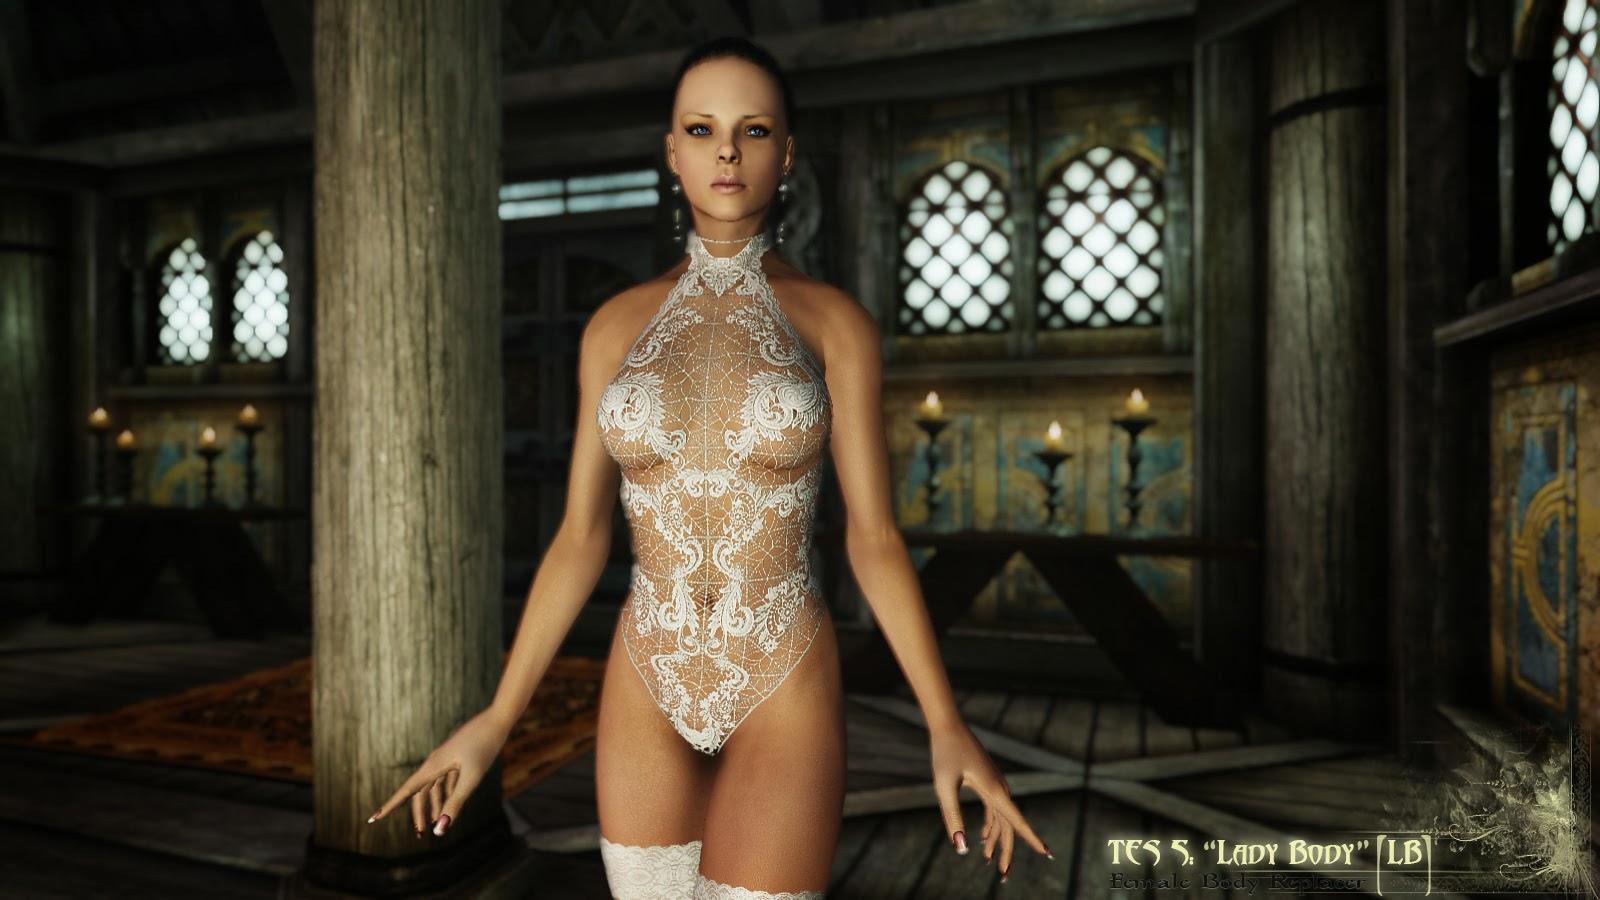 Skyrim nudity mod hentia picture